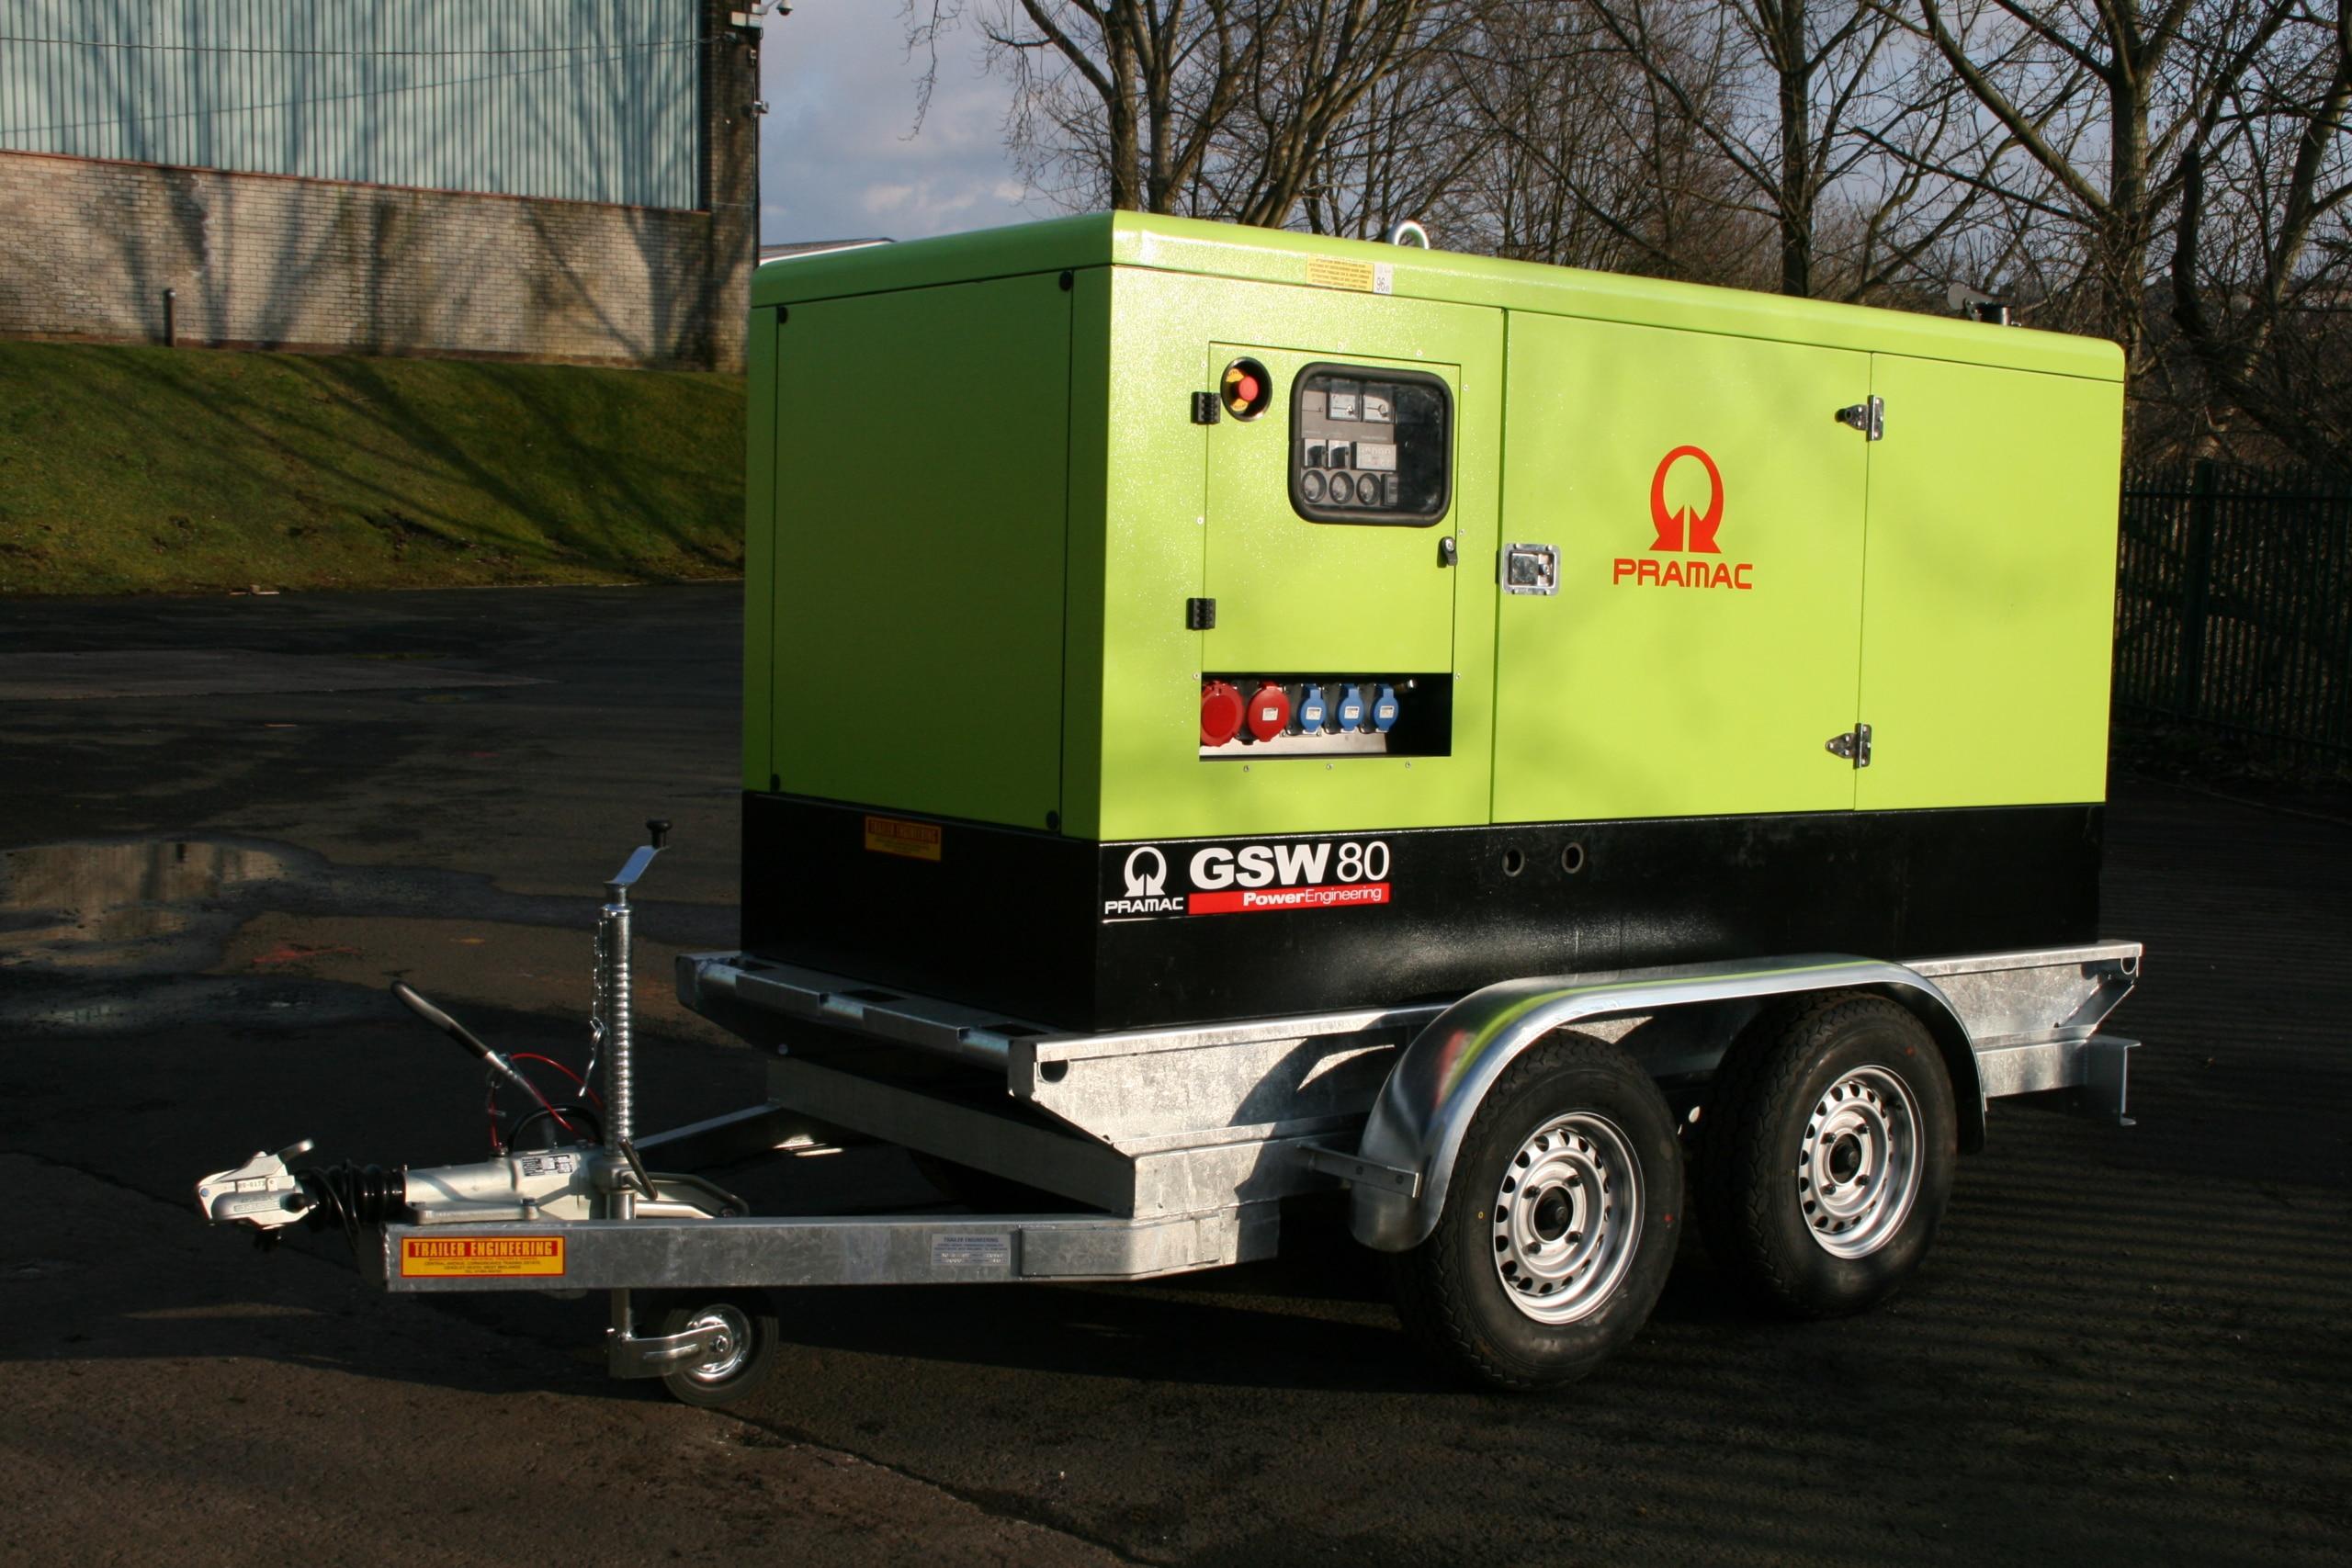 Pramac generator trailer